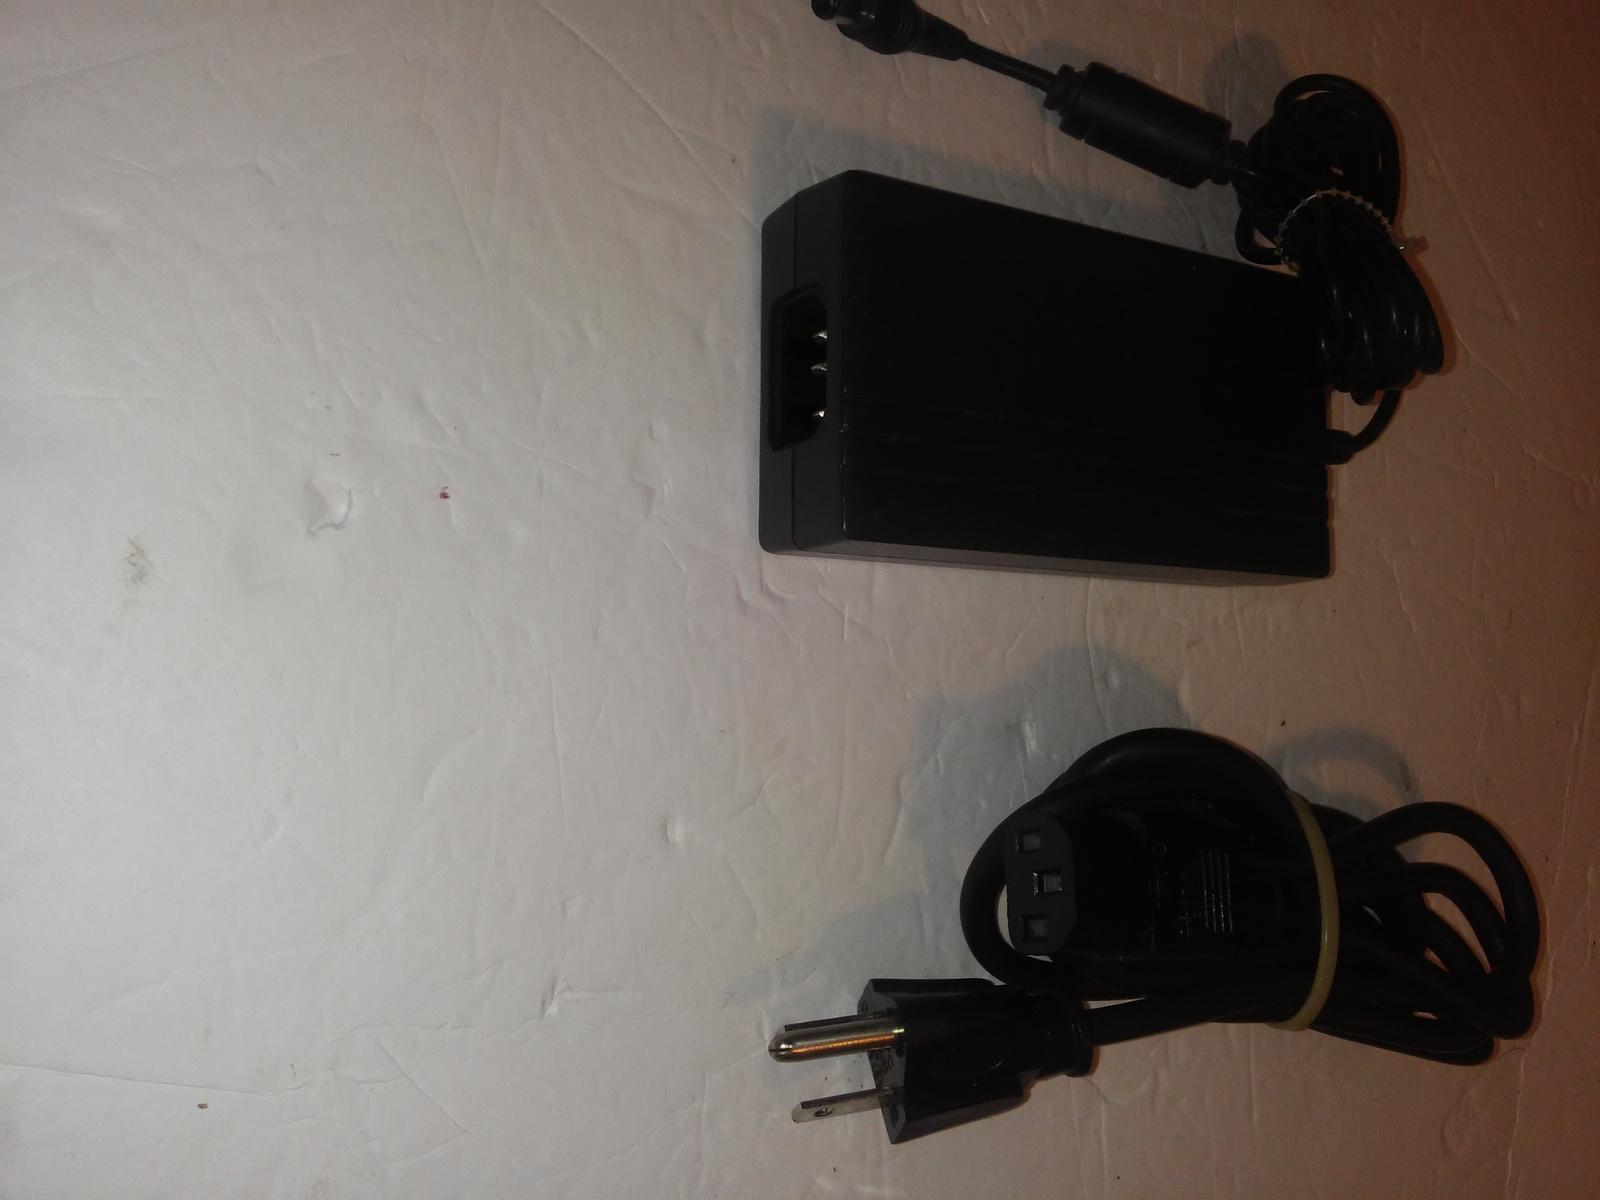 hight resolution of samsung sens 700 sens 710 sens 750 sens 8 sens 800 laptop